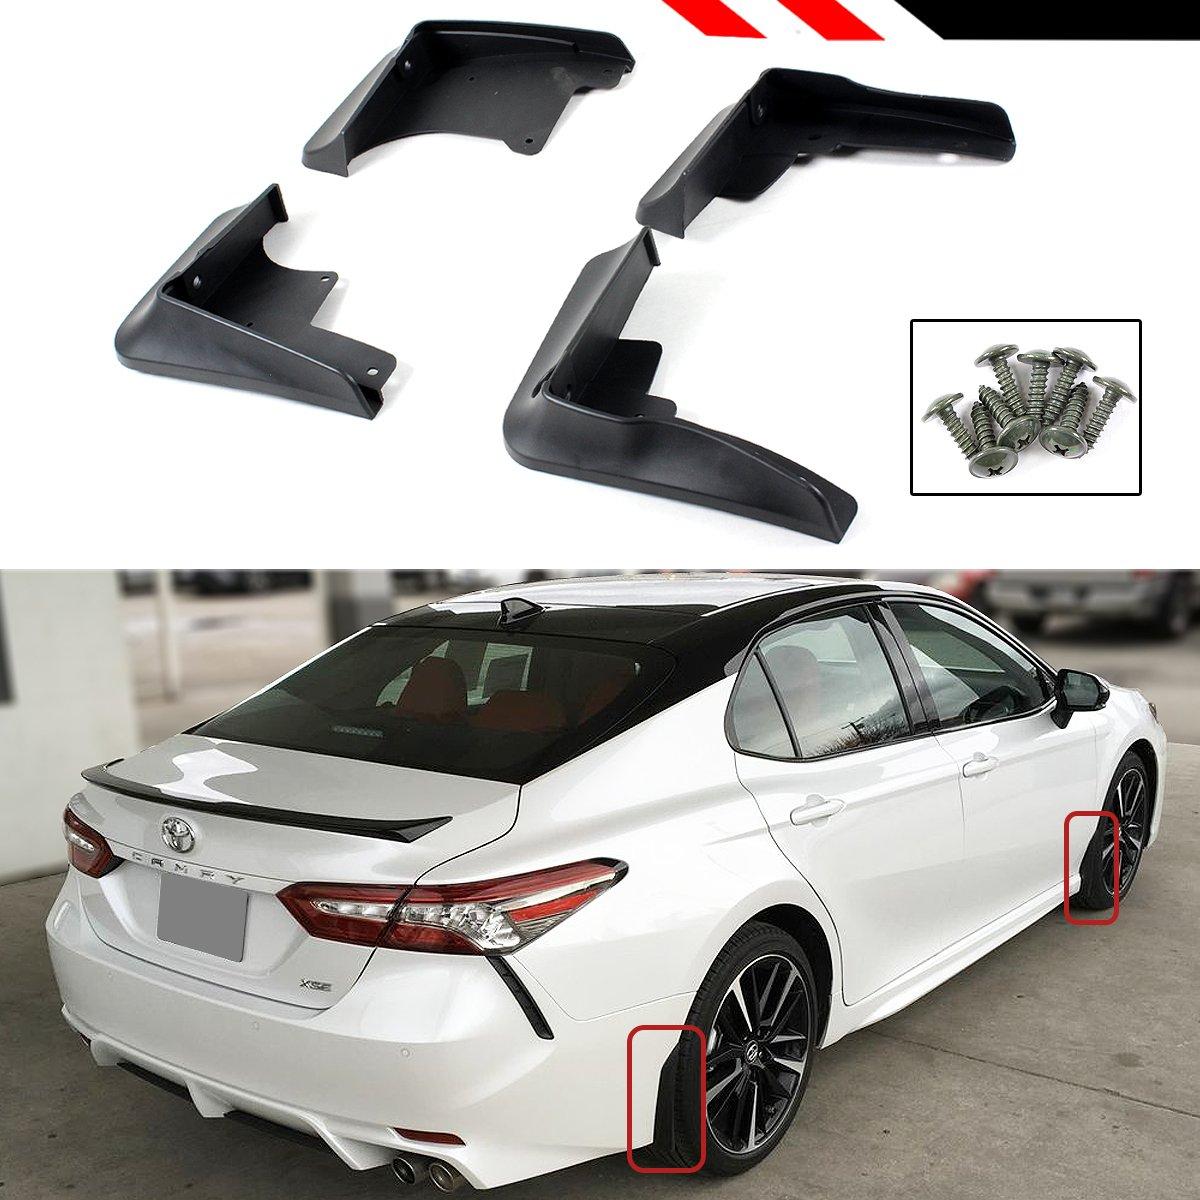 Cuztom Tuning for 2018 Toyota Camry SE XSE Sport 4 PCS Front & Rear Splash Guard MUD Flap Set